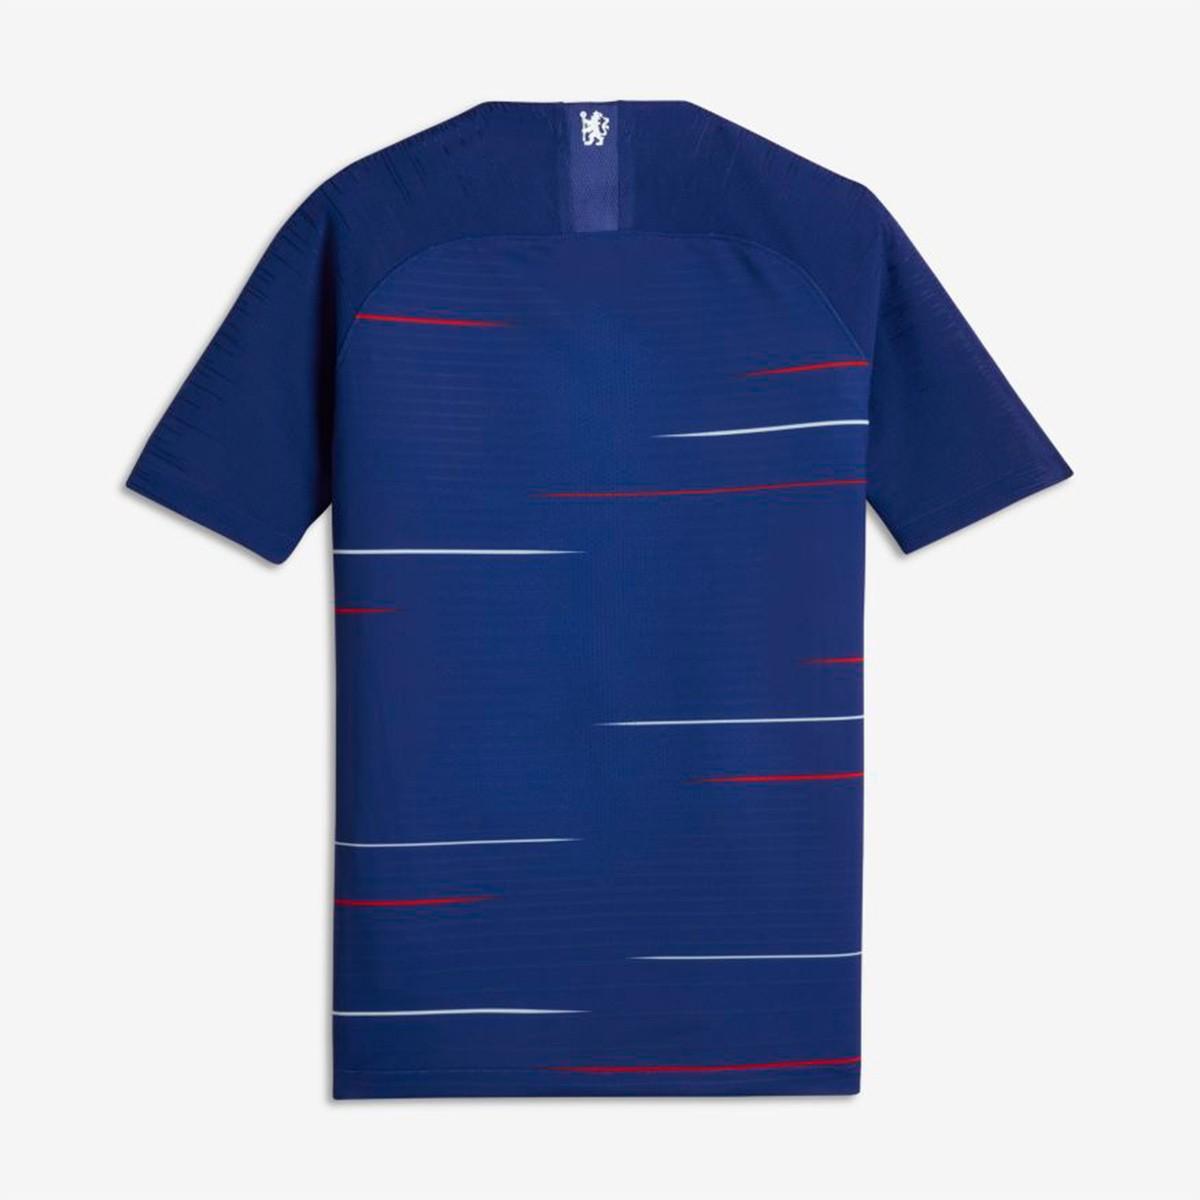 d3a1734204428 Camiseta Nike Chelsea FC Vapor Primera Equipación 2018-2019 Niño Rush  blue-White - Tienda de fútbol Fútbol Emotion